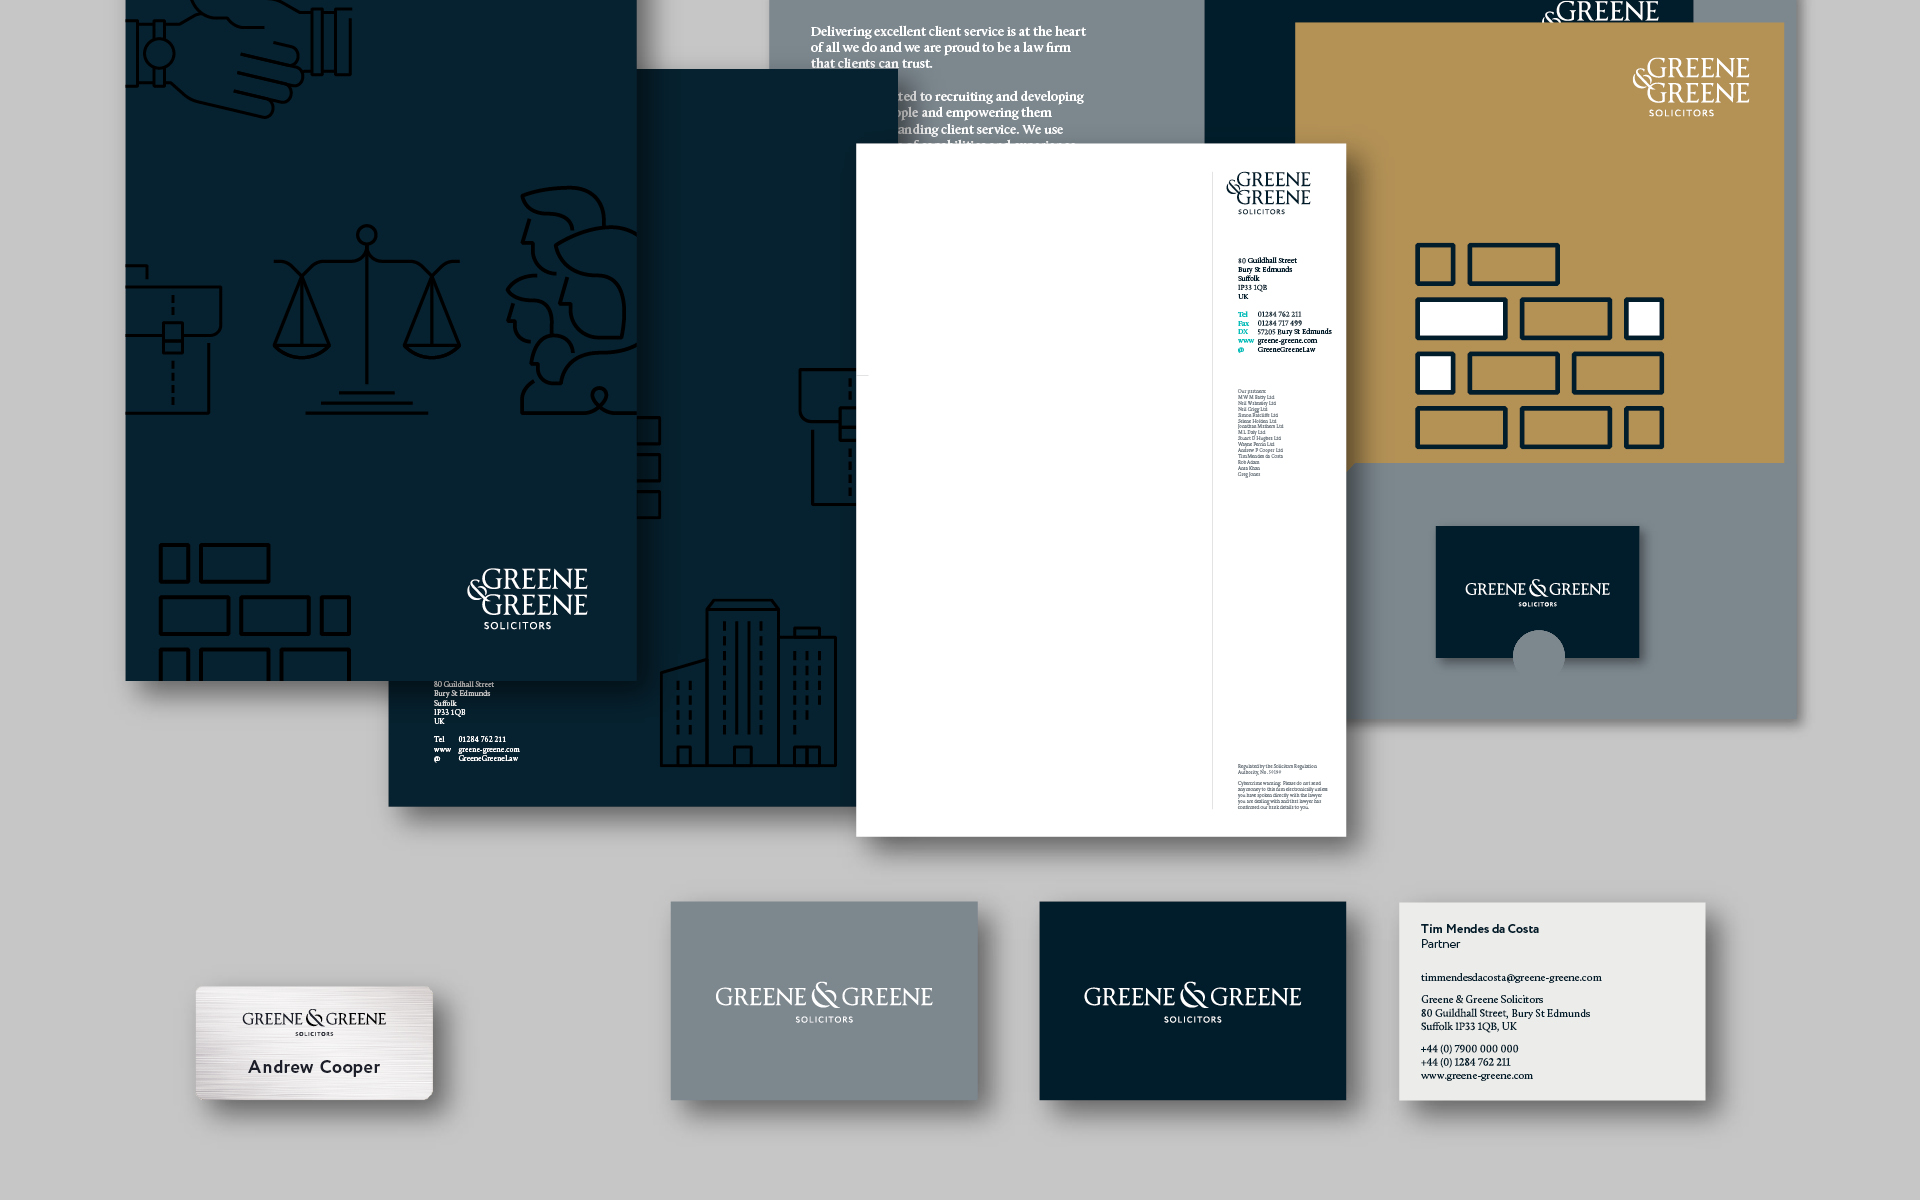 Stationery design mock up for Greene & Greene